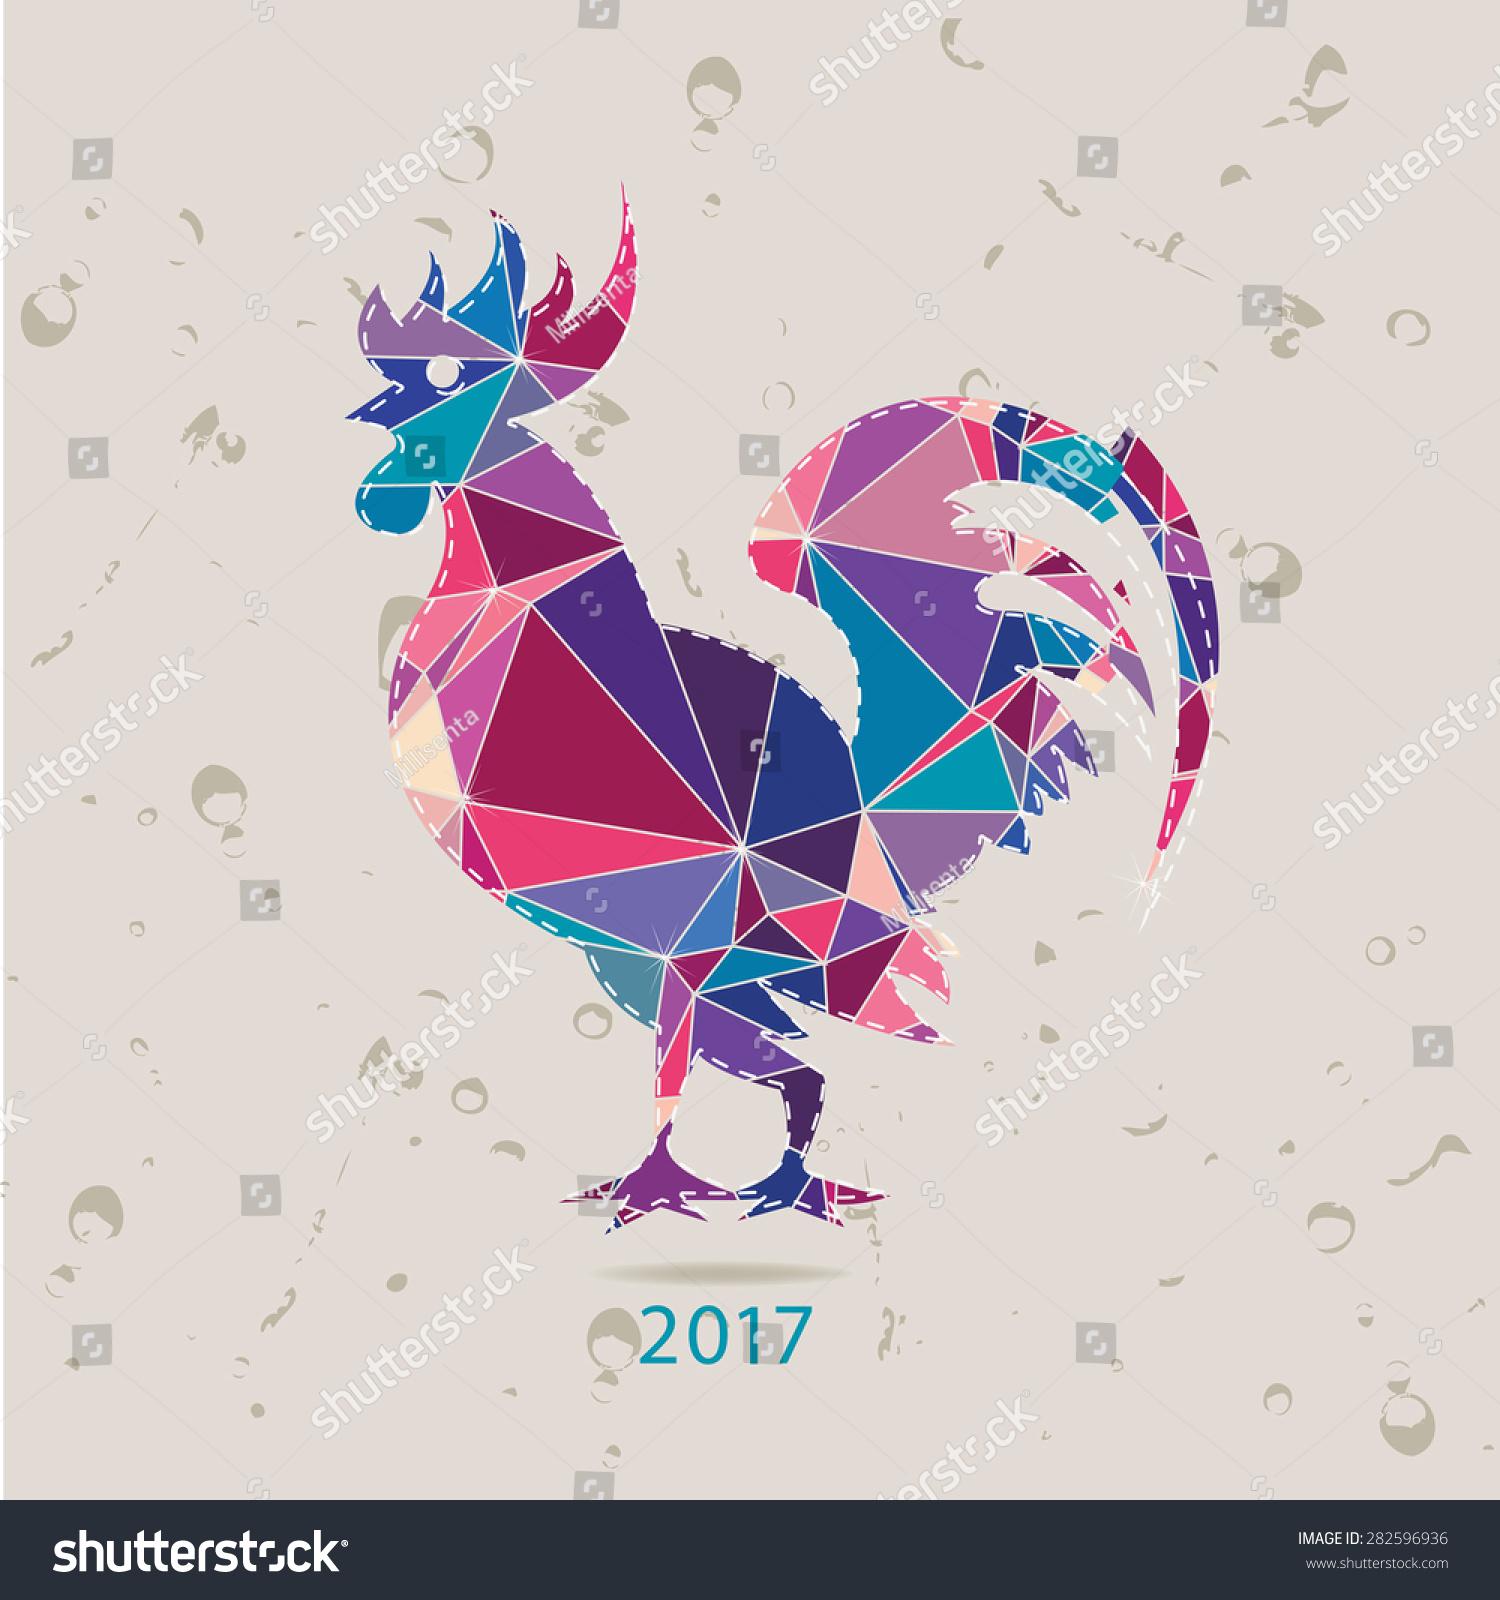 Рисунки 2017 года своими руками